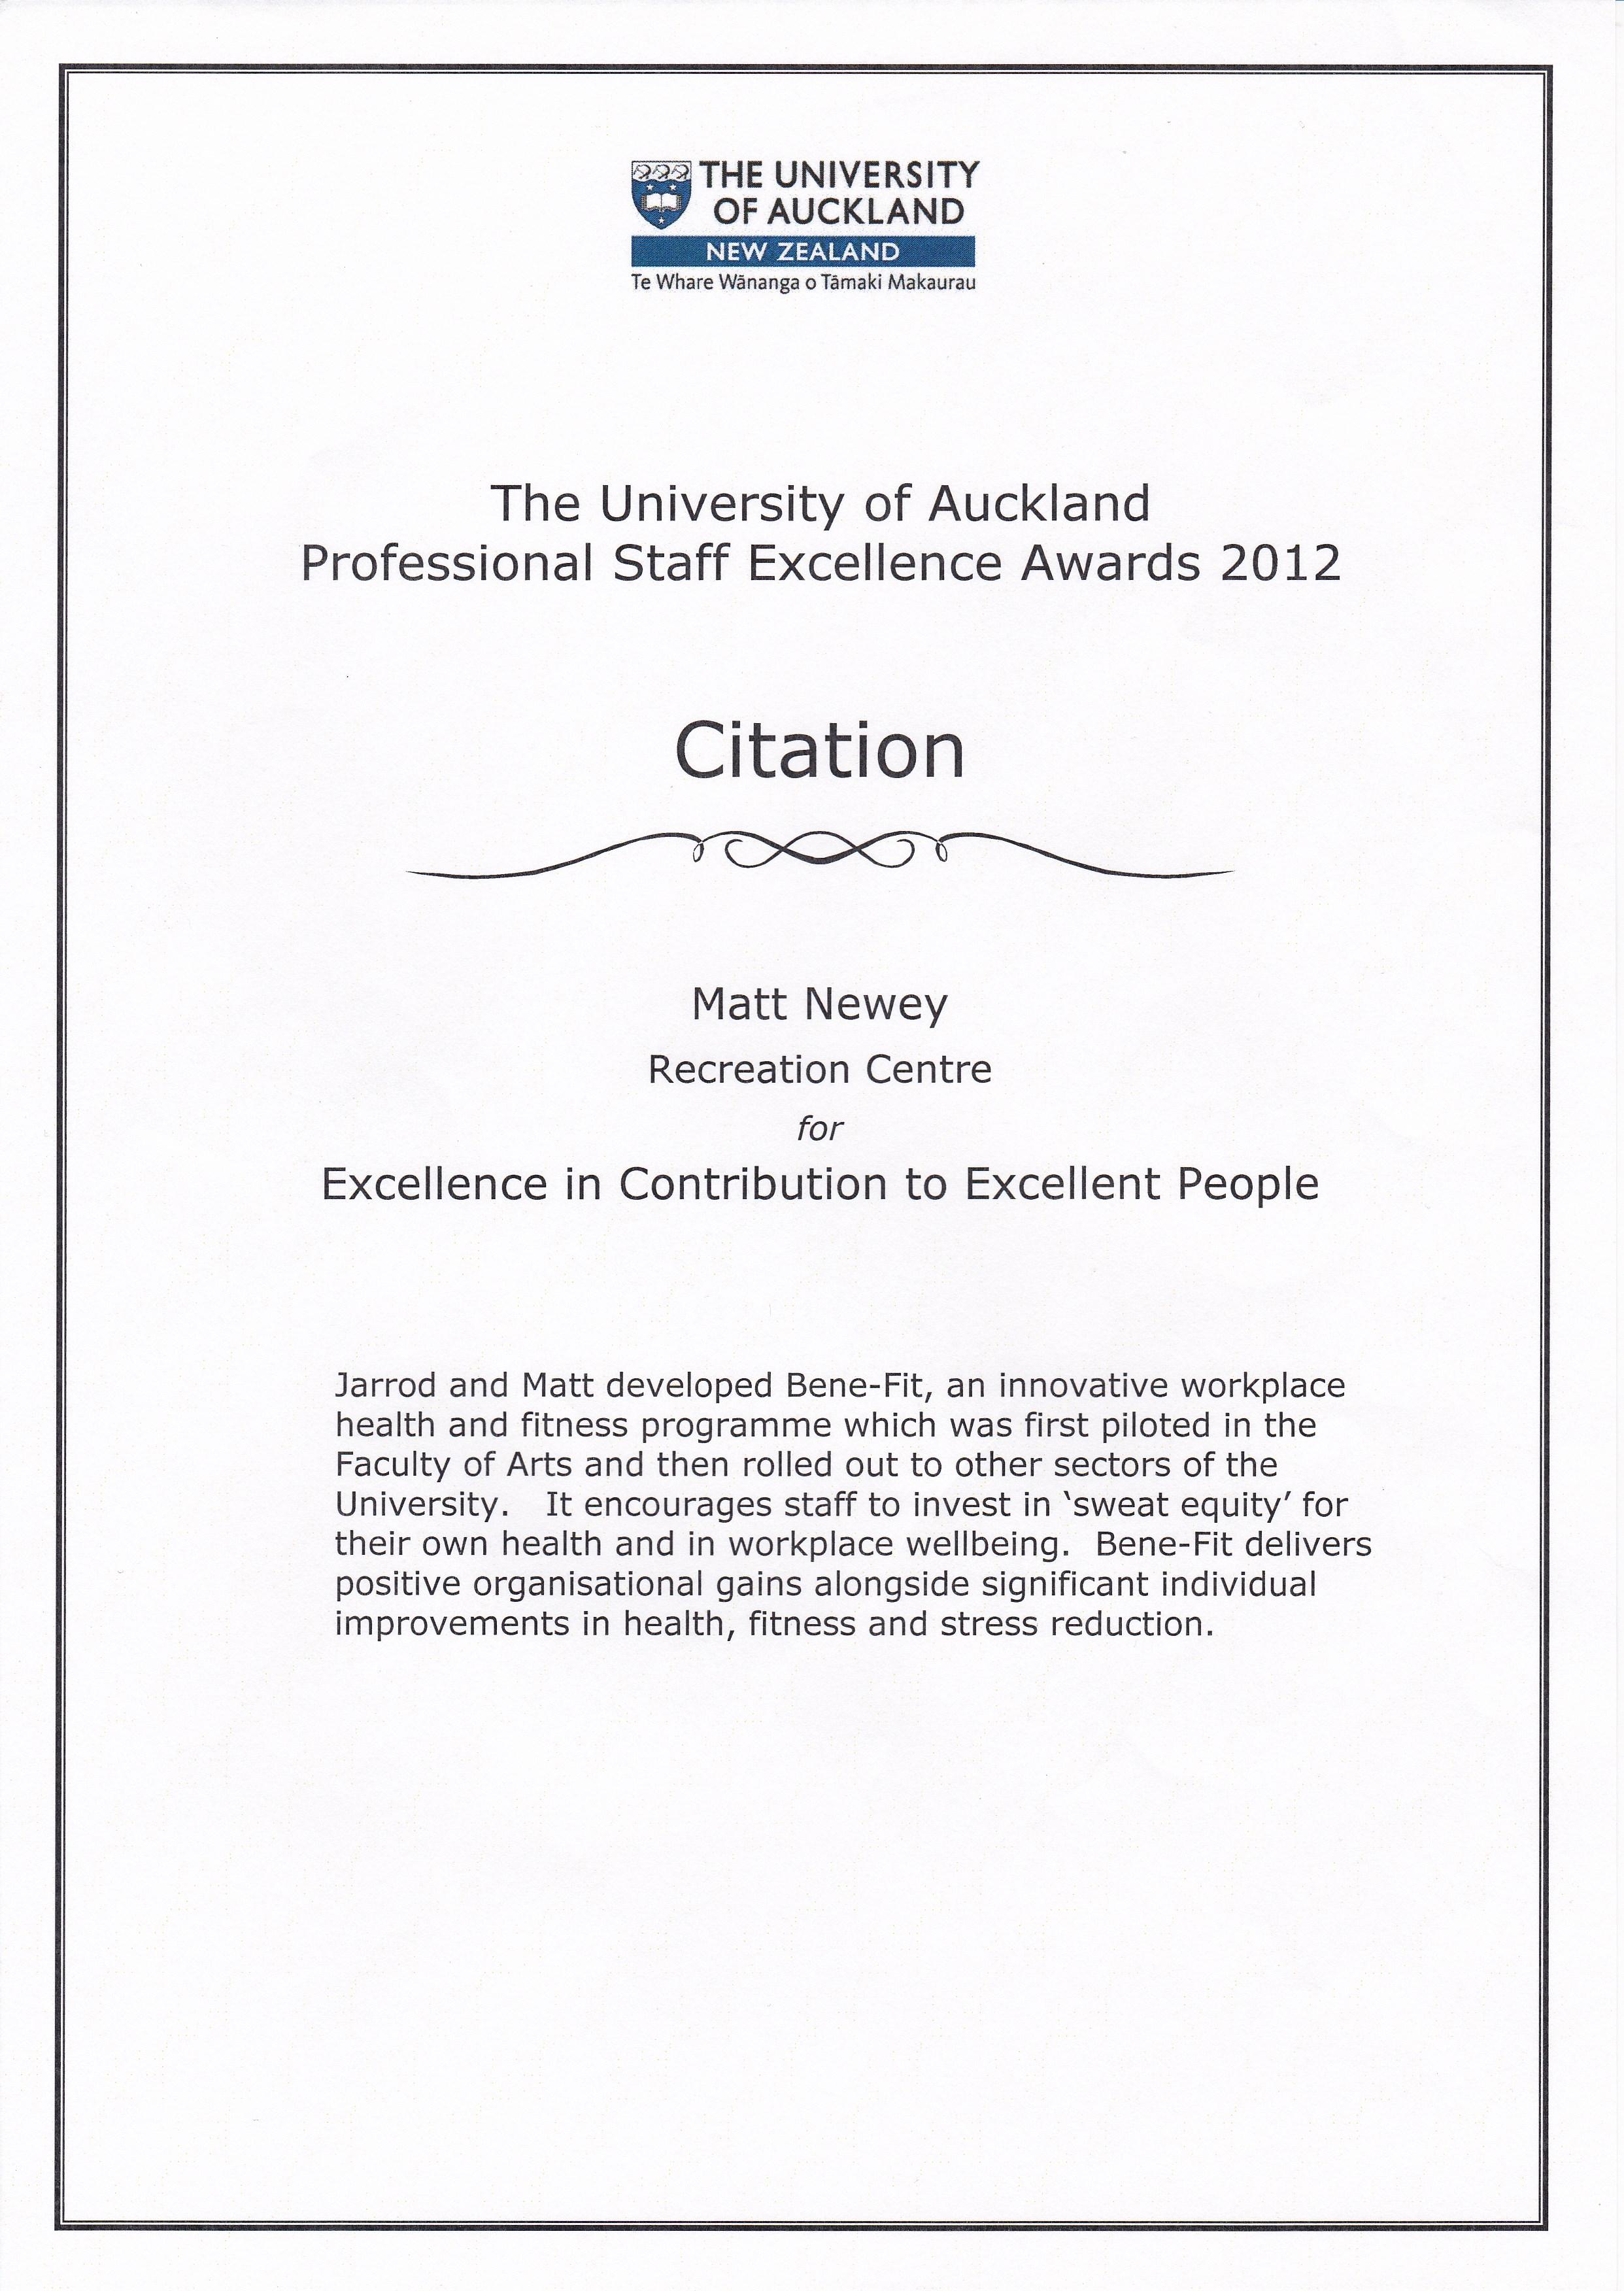 Excellence award citation.jpg